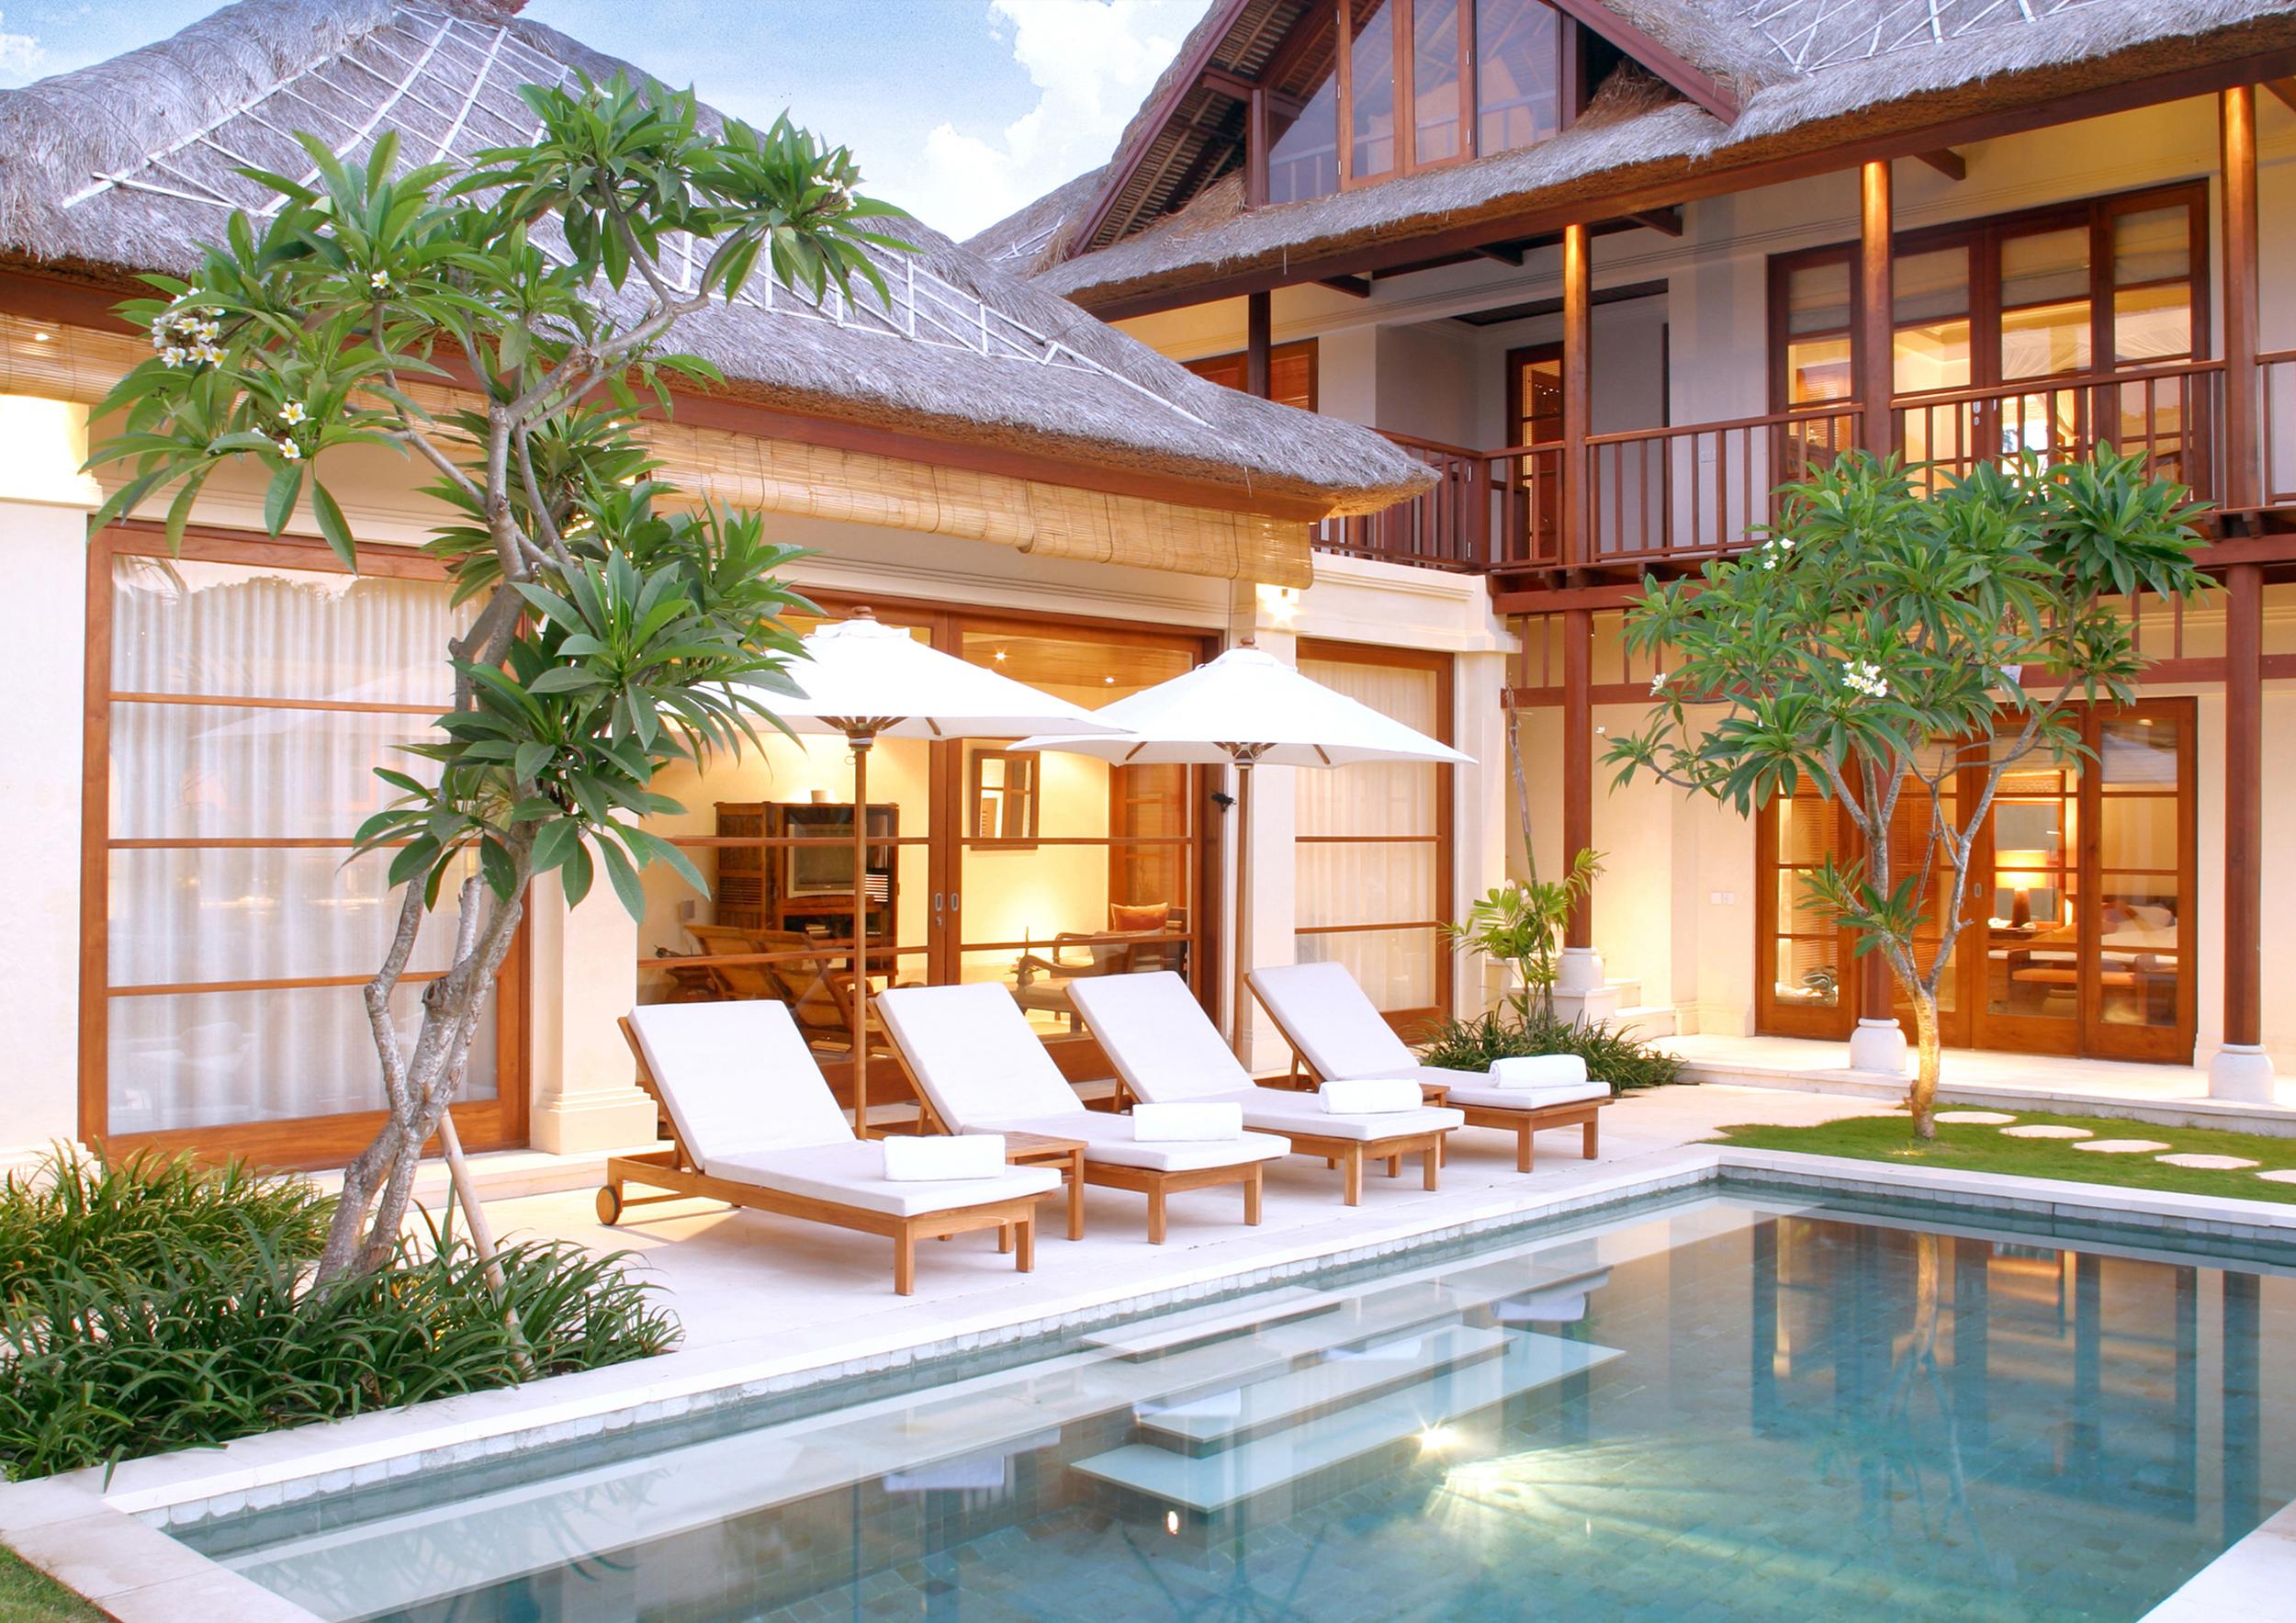 kj_luxury_pool_villa_L-03.jpg